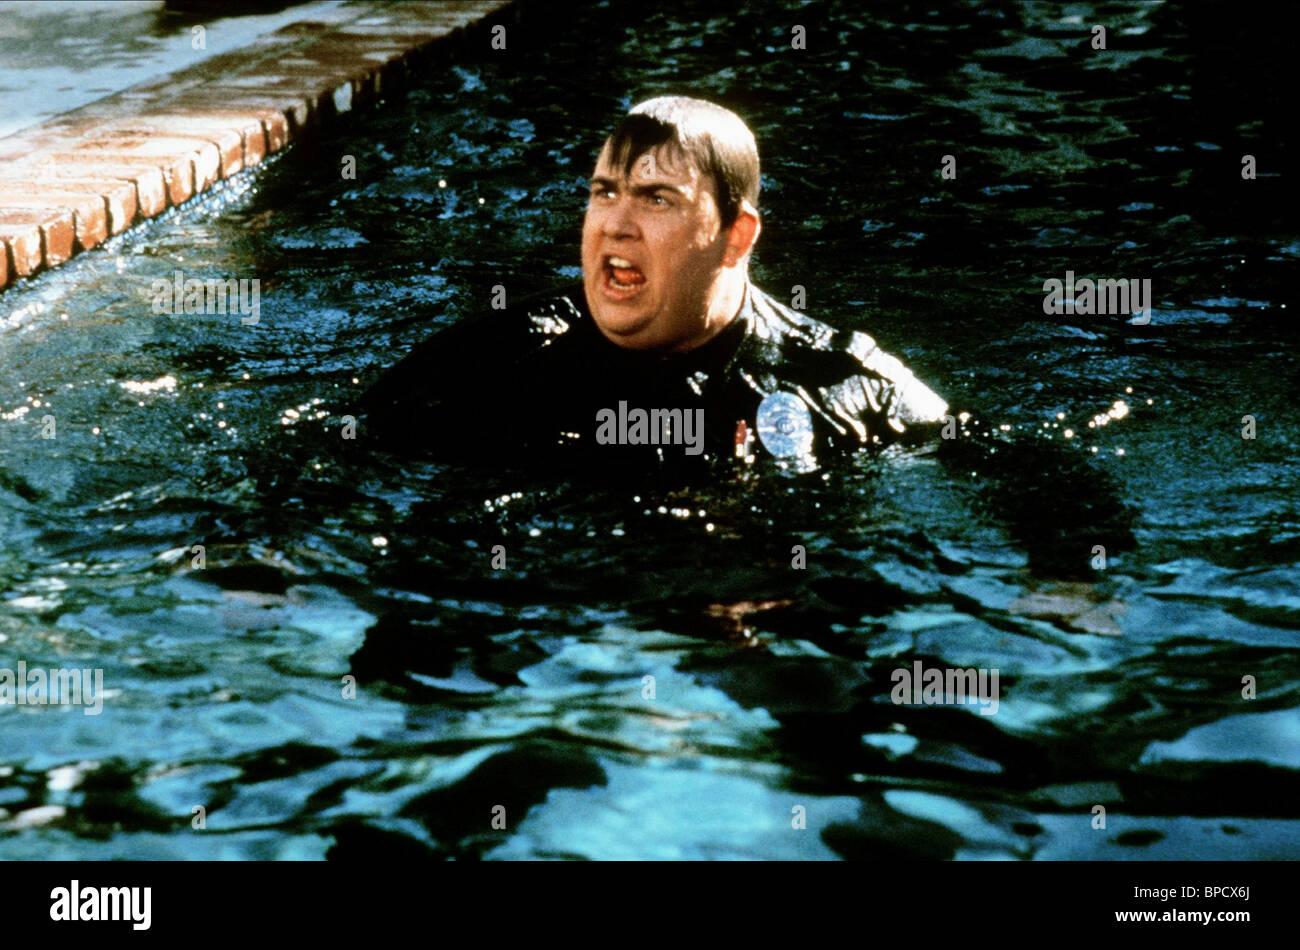 JOHN CANDY armadas y peligrosas (1986) Imagen De Stock